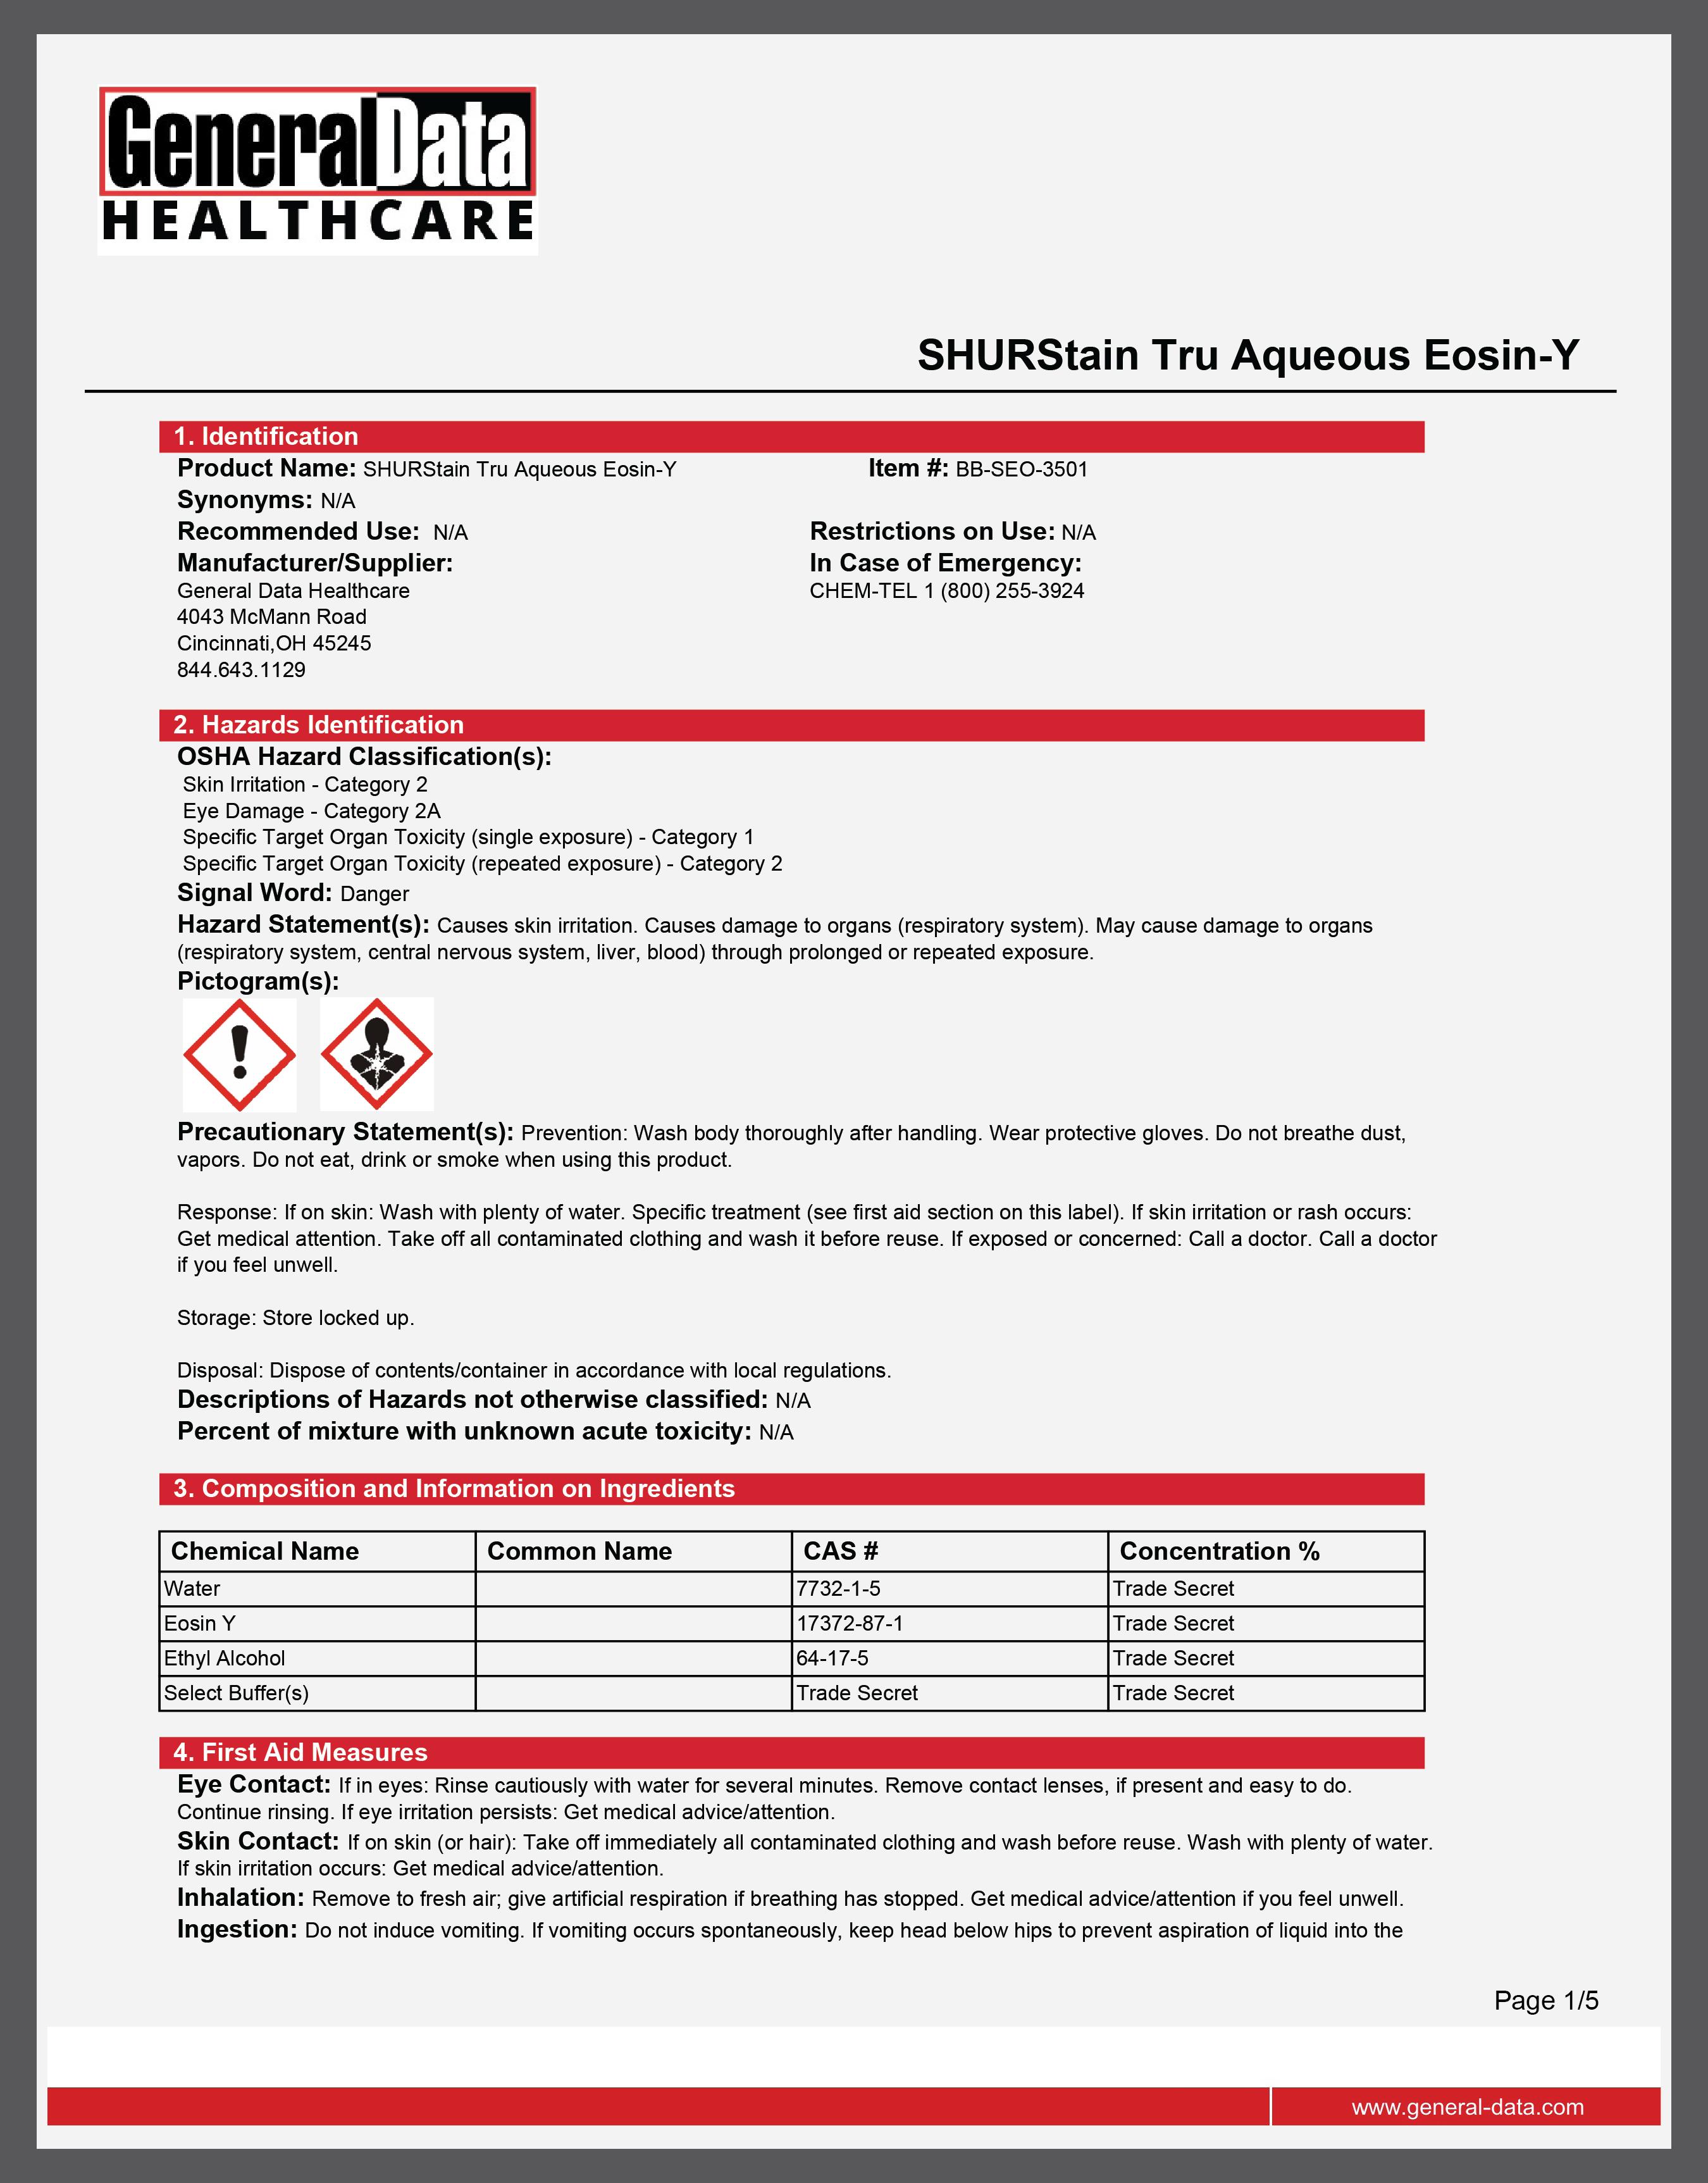 SHURStain Tru Aqueous Eosin-Y Safety Data Sheet